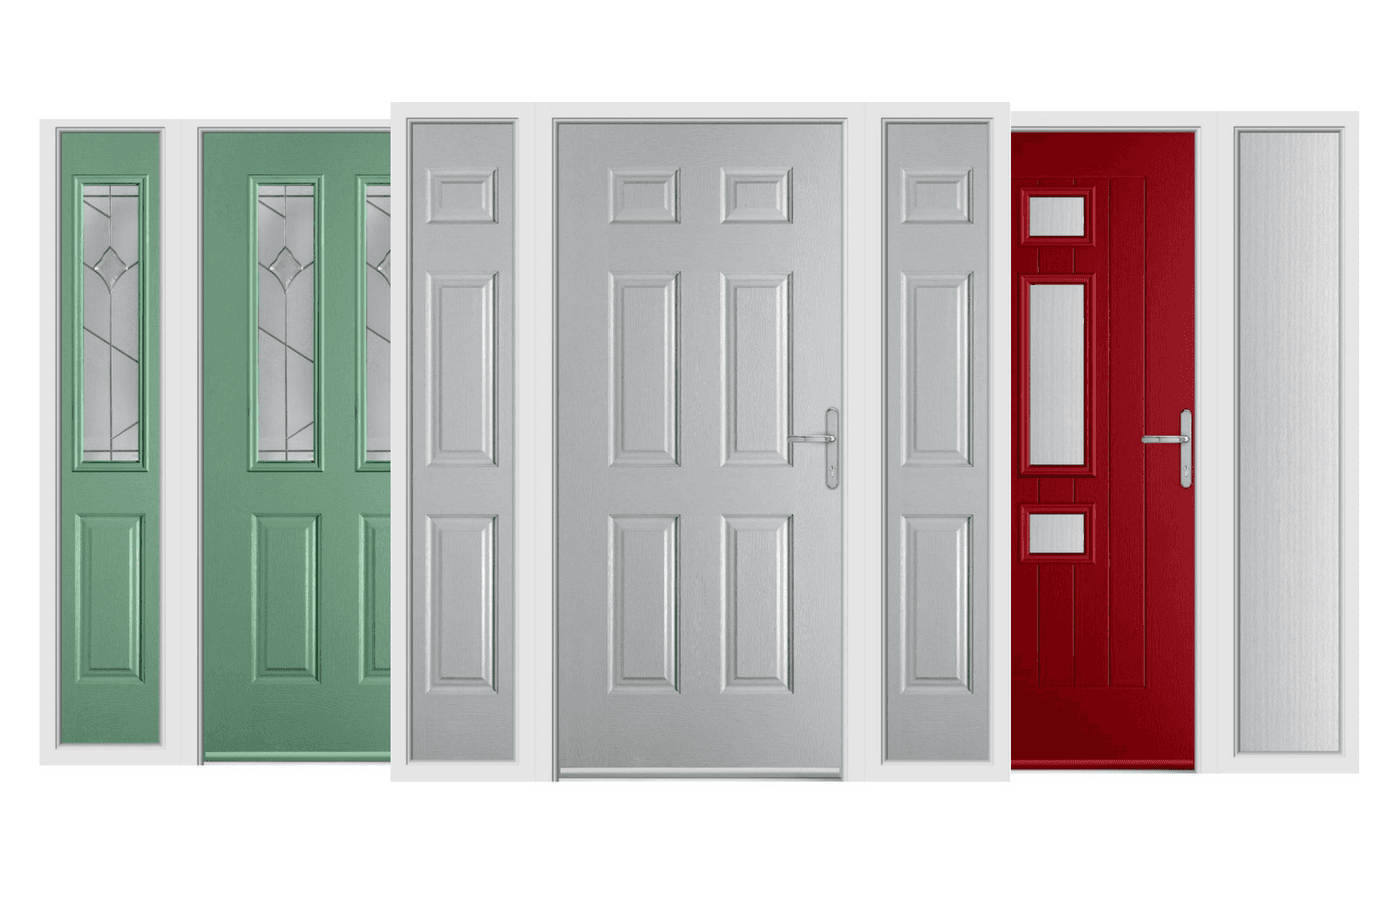 Composite Fire Doors Timeline Image